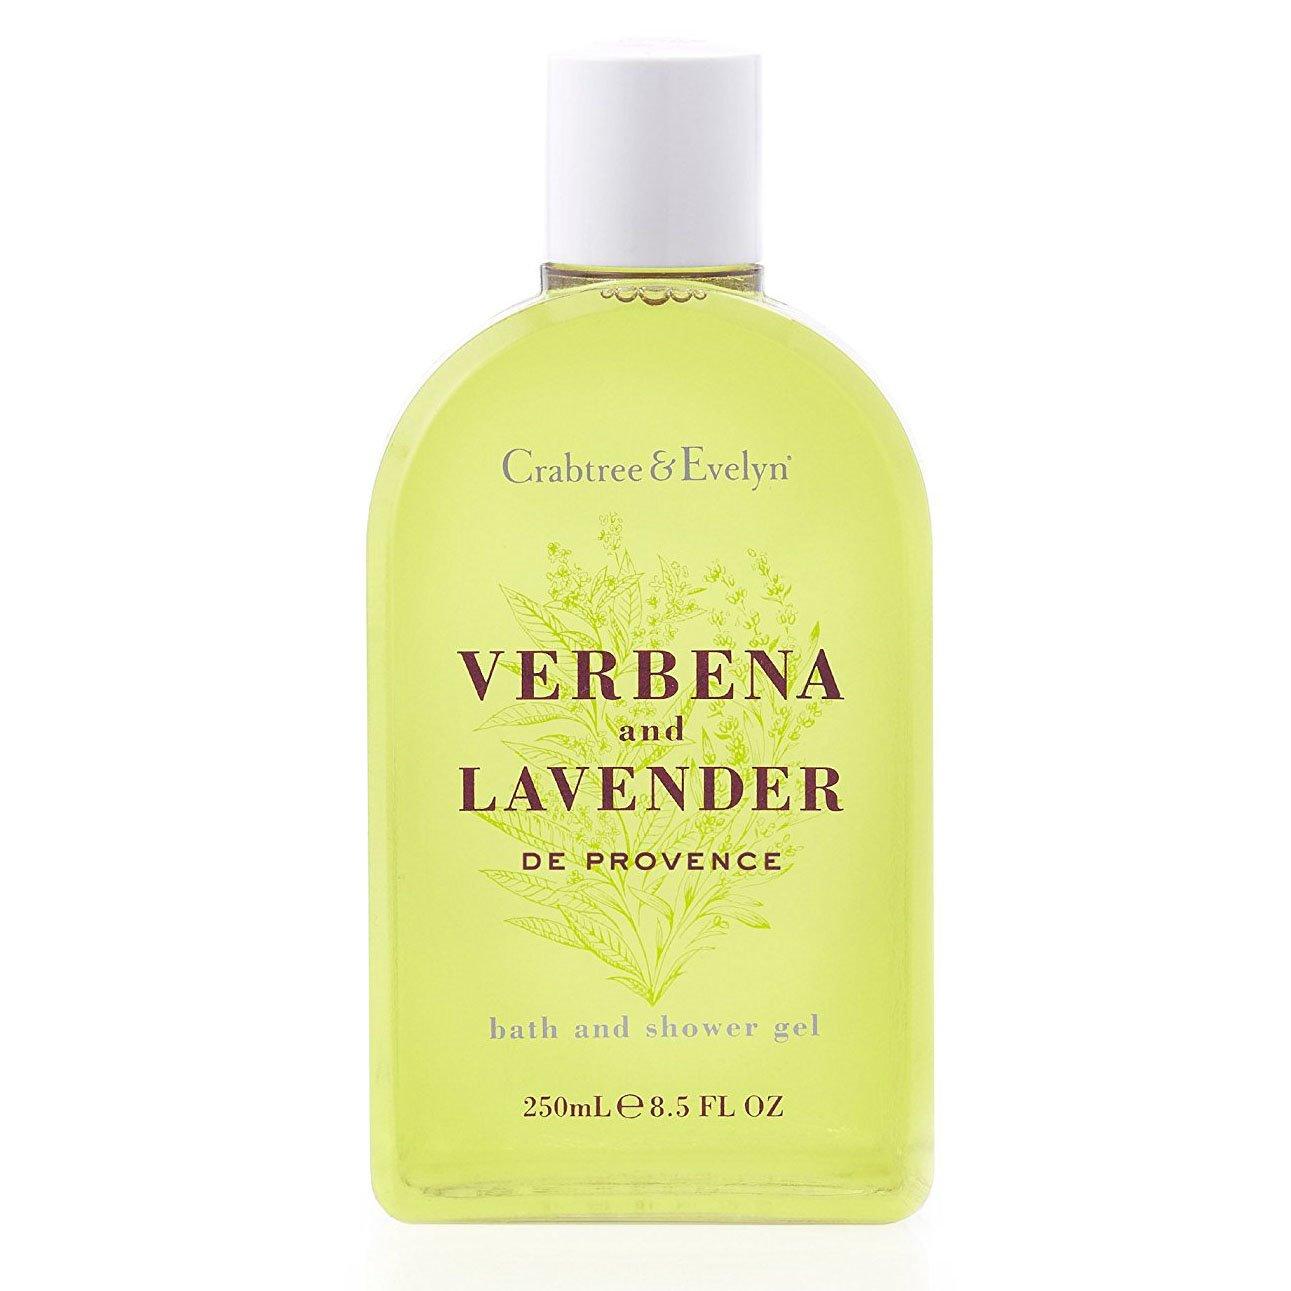 crabtree evelyn verbena and lavender de provence bath shower gel pc fallon. Black Bedroom Furniture Sets. Home Design Ideas